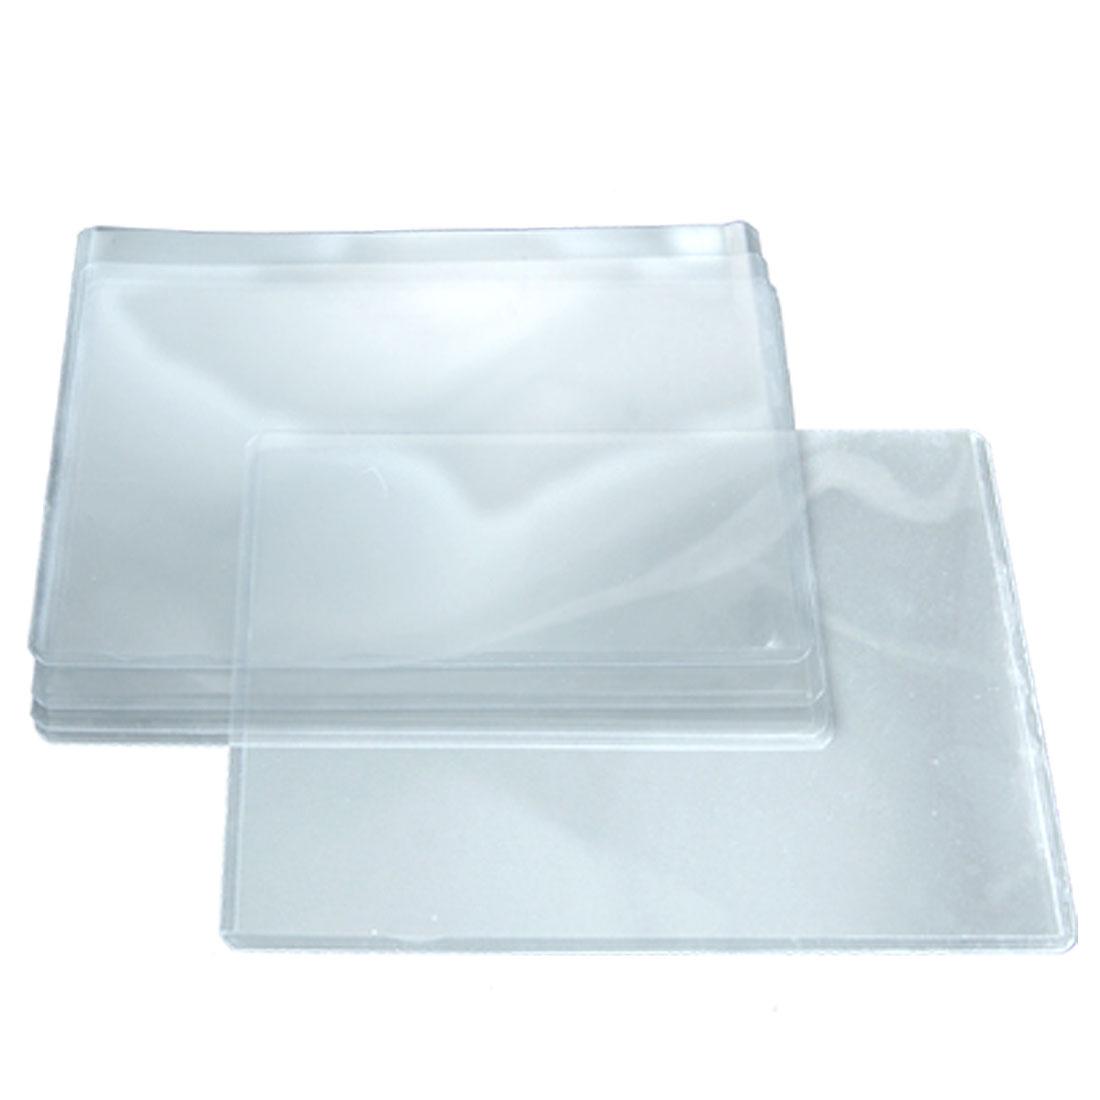 A5 Document Files Photos Card Case Plastic Horizontal Holder 5 Pcs